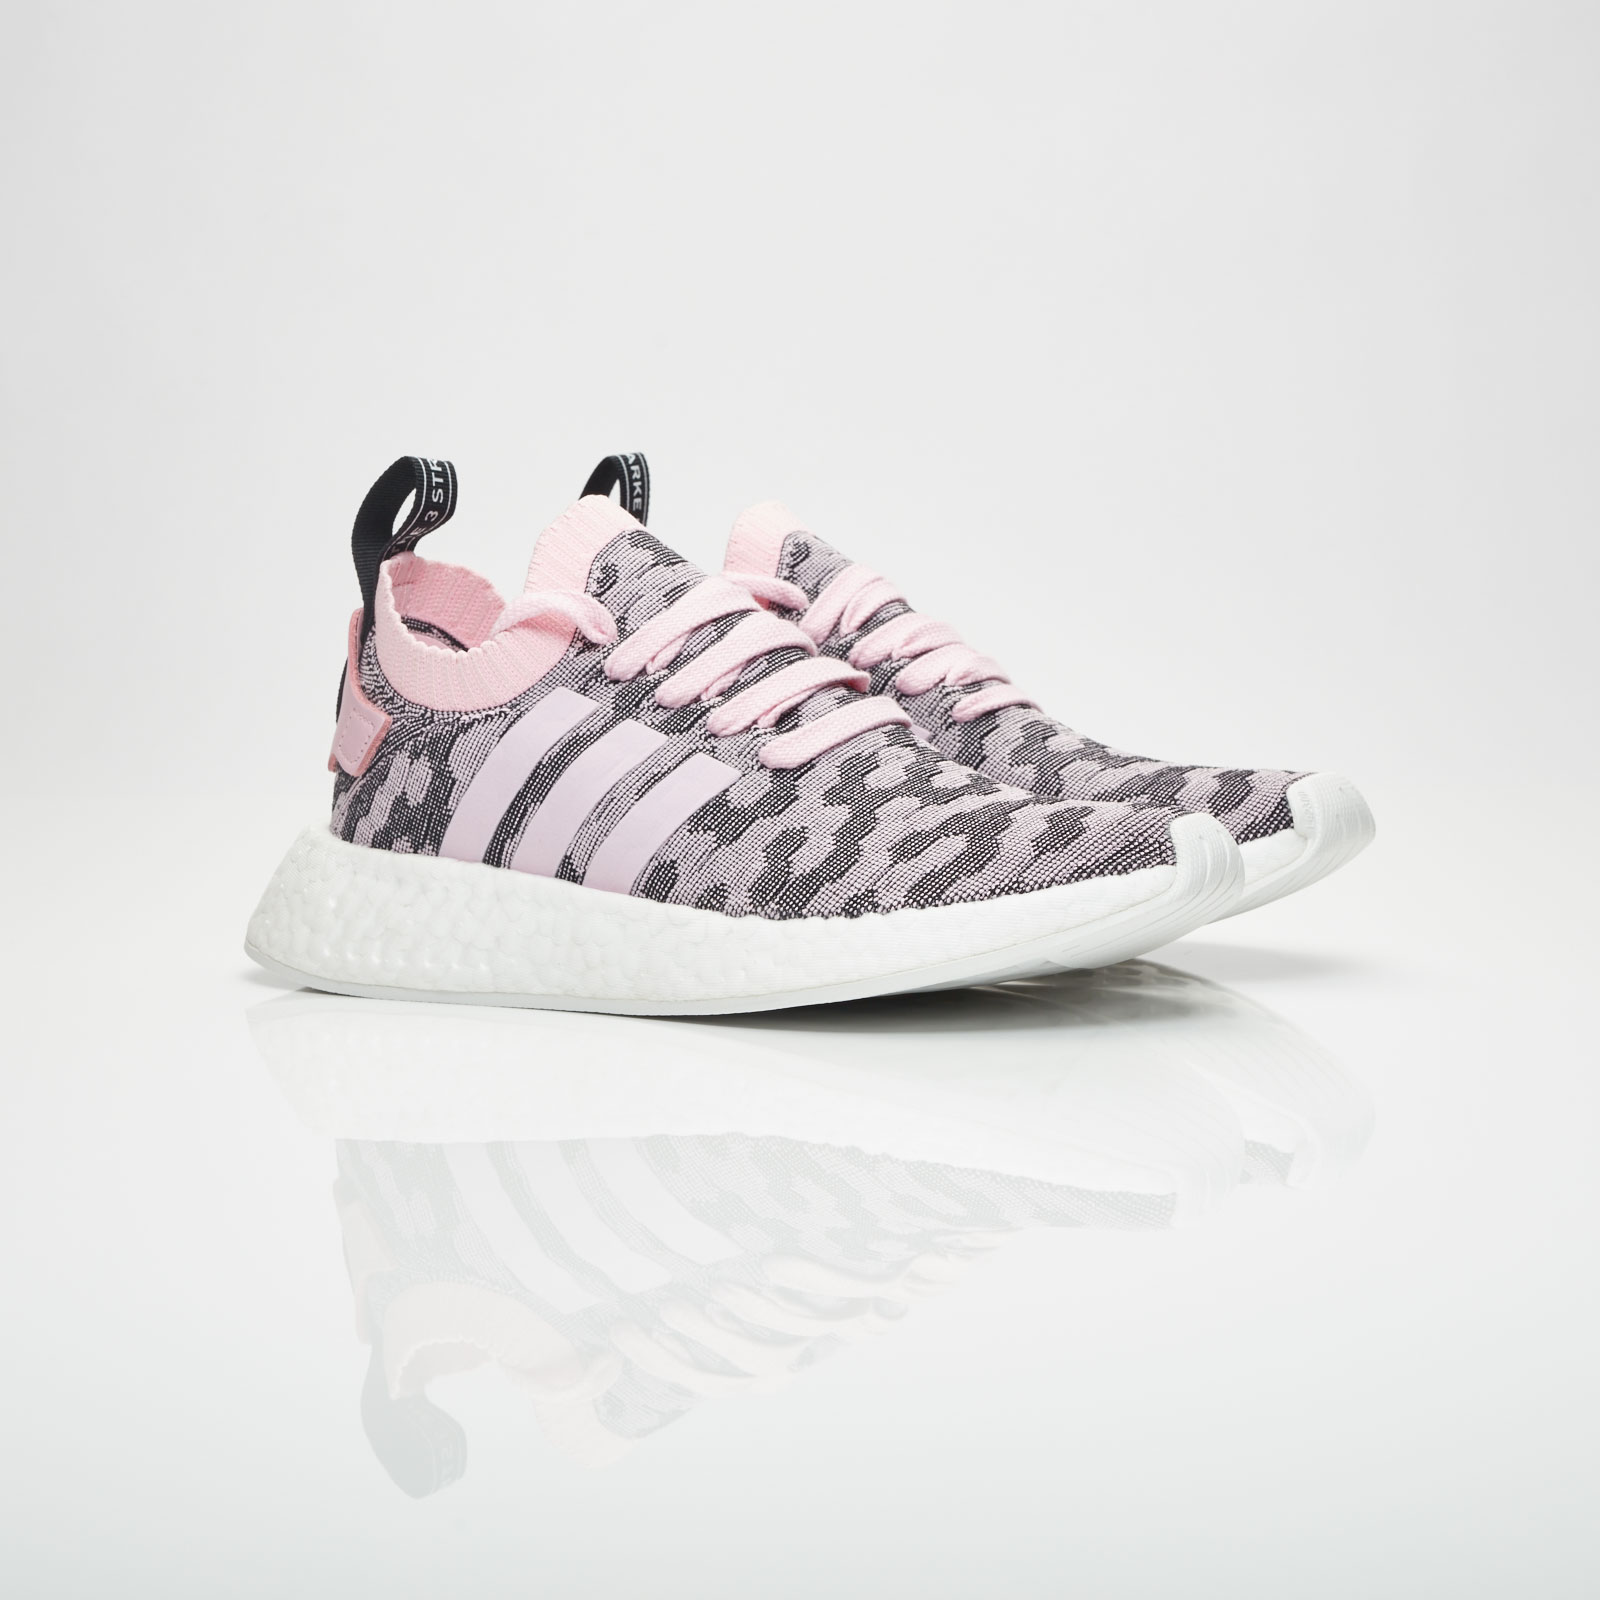 dbdb4da6ebc adidas NMD R2 PK W - By9521 - Sneakersnstuff